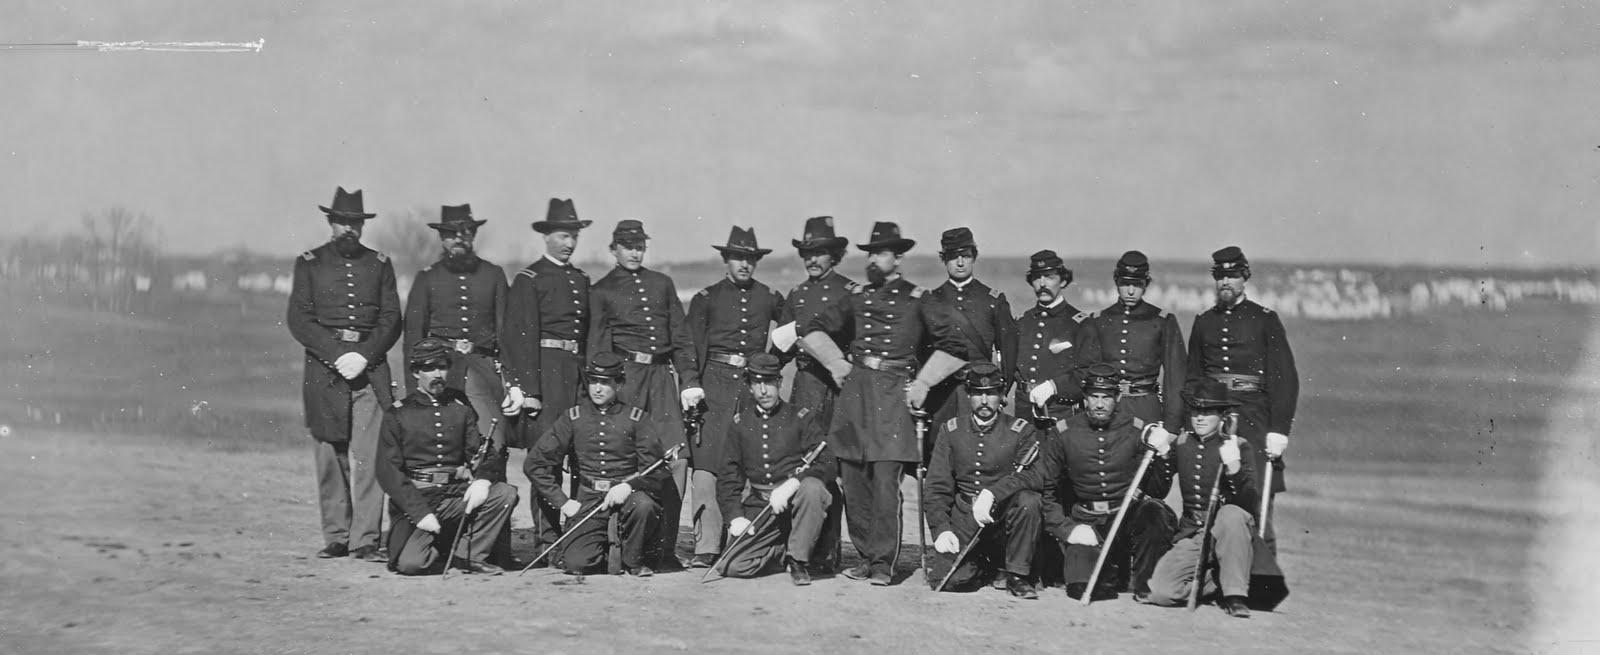 http://1.bp.blogspot.com/-x8vlaHB1dG4/TsfYBfhRyPI/AAAAAAAAAu0/MQxs2kQTuS8/s1600/B-155+Camp+Scene%252C+Group+of+Officers%252C+44th+New+York+Infantry.jpg